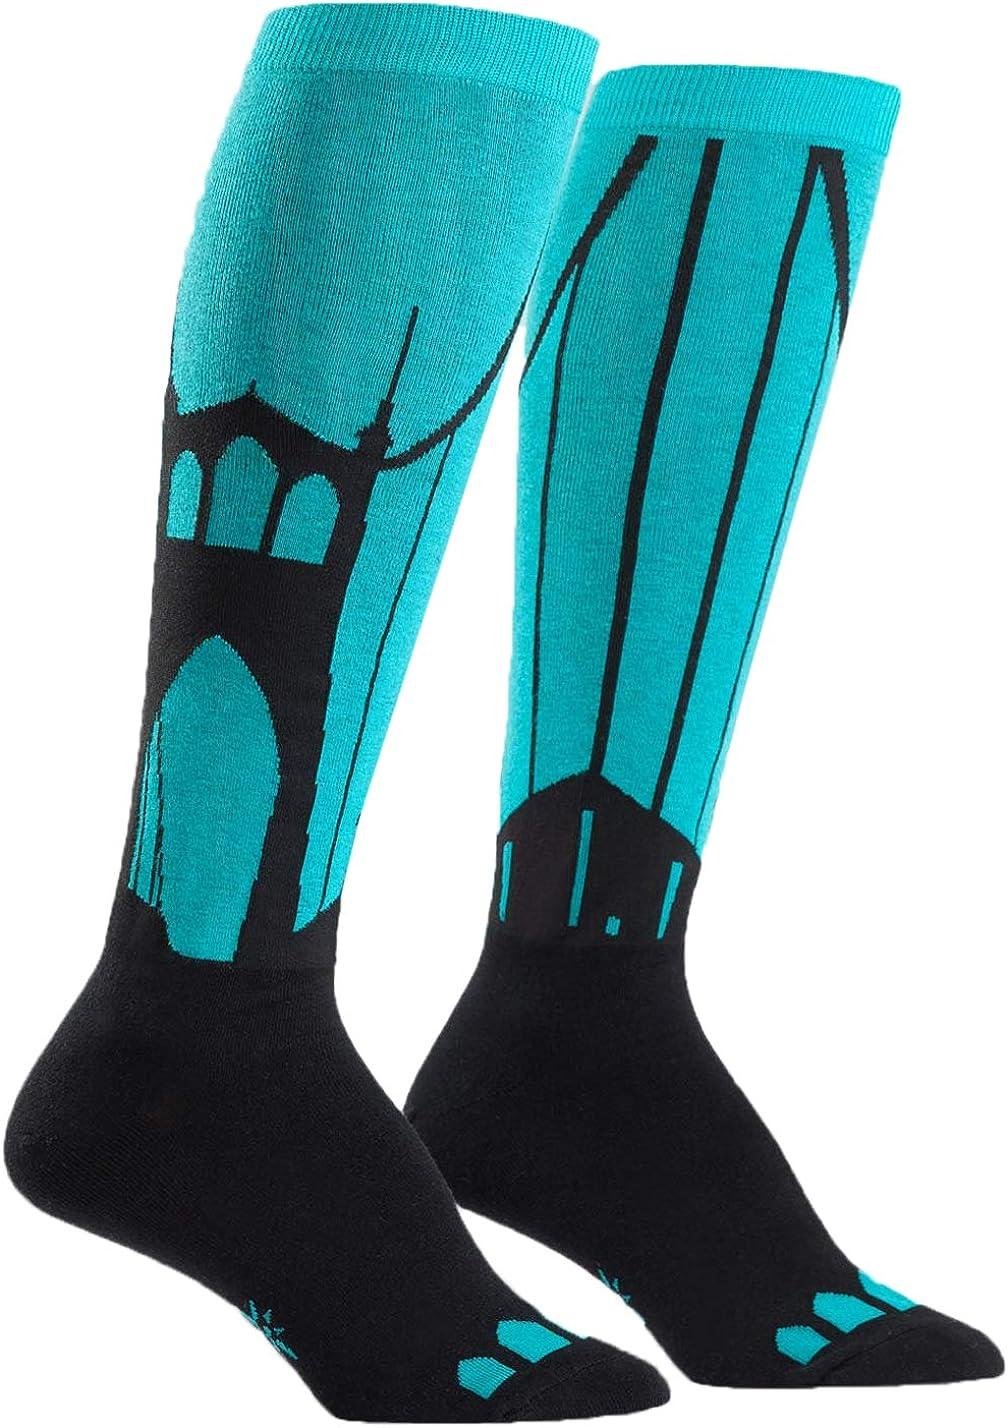 Sock It To free Me Put A On High Ranking TOP2 Knee Womens Bridge Socks